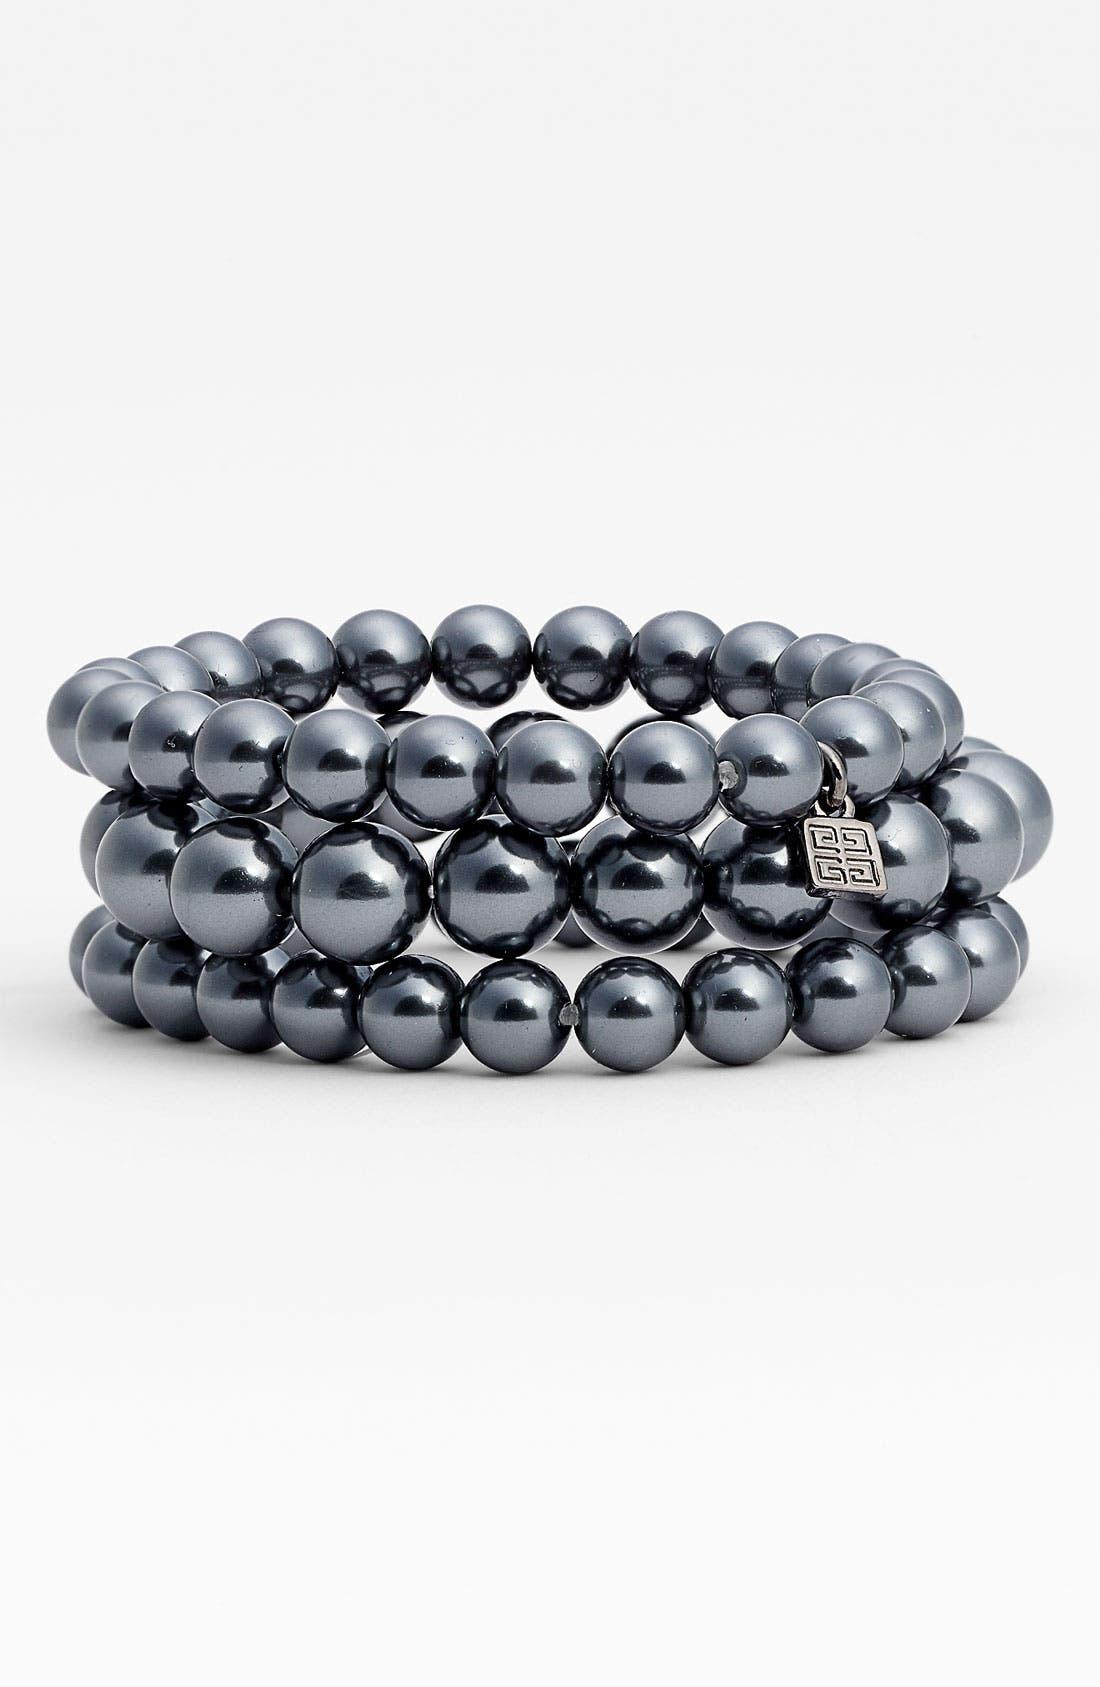 Alternate Image 1 Selected - Givenchy Glass Pearl Stretch Bracelets (Set of 3)